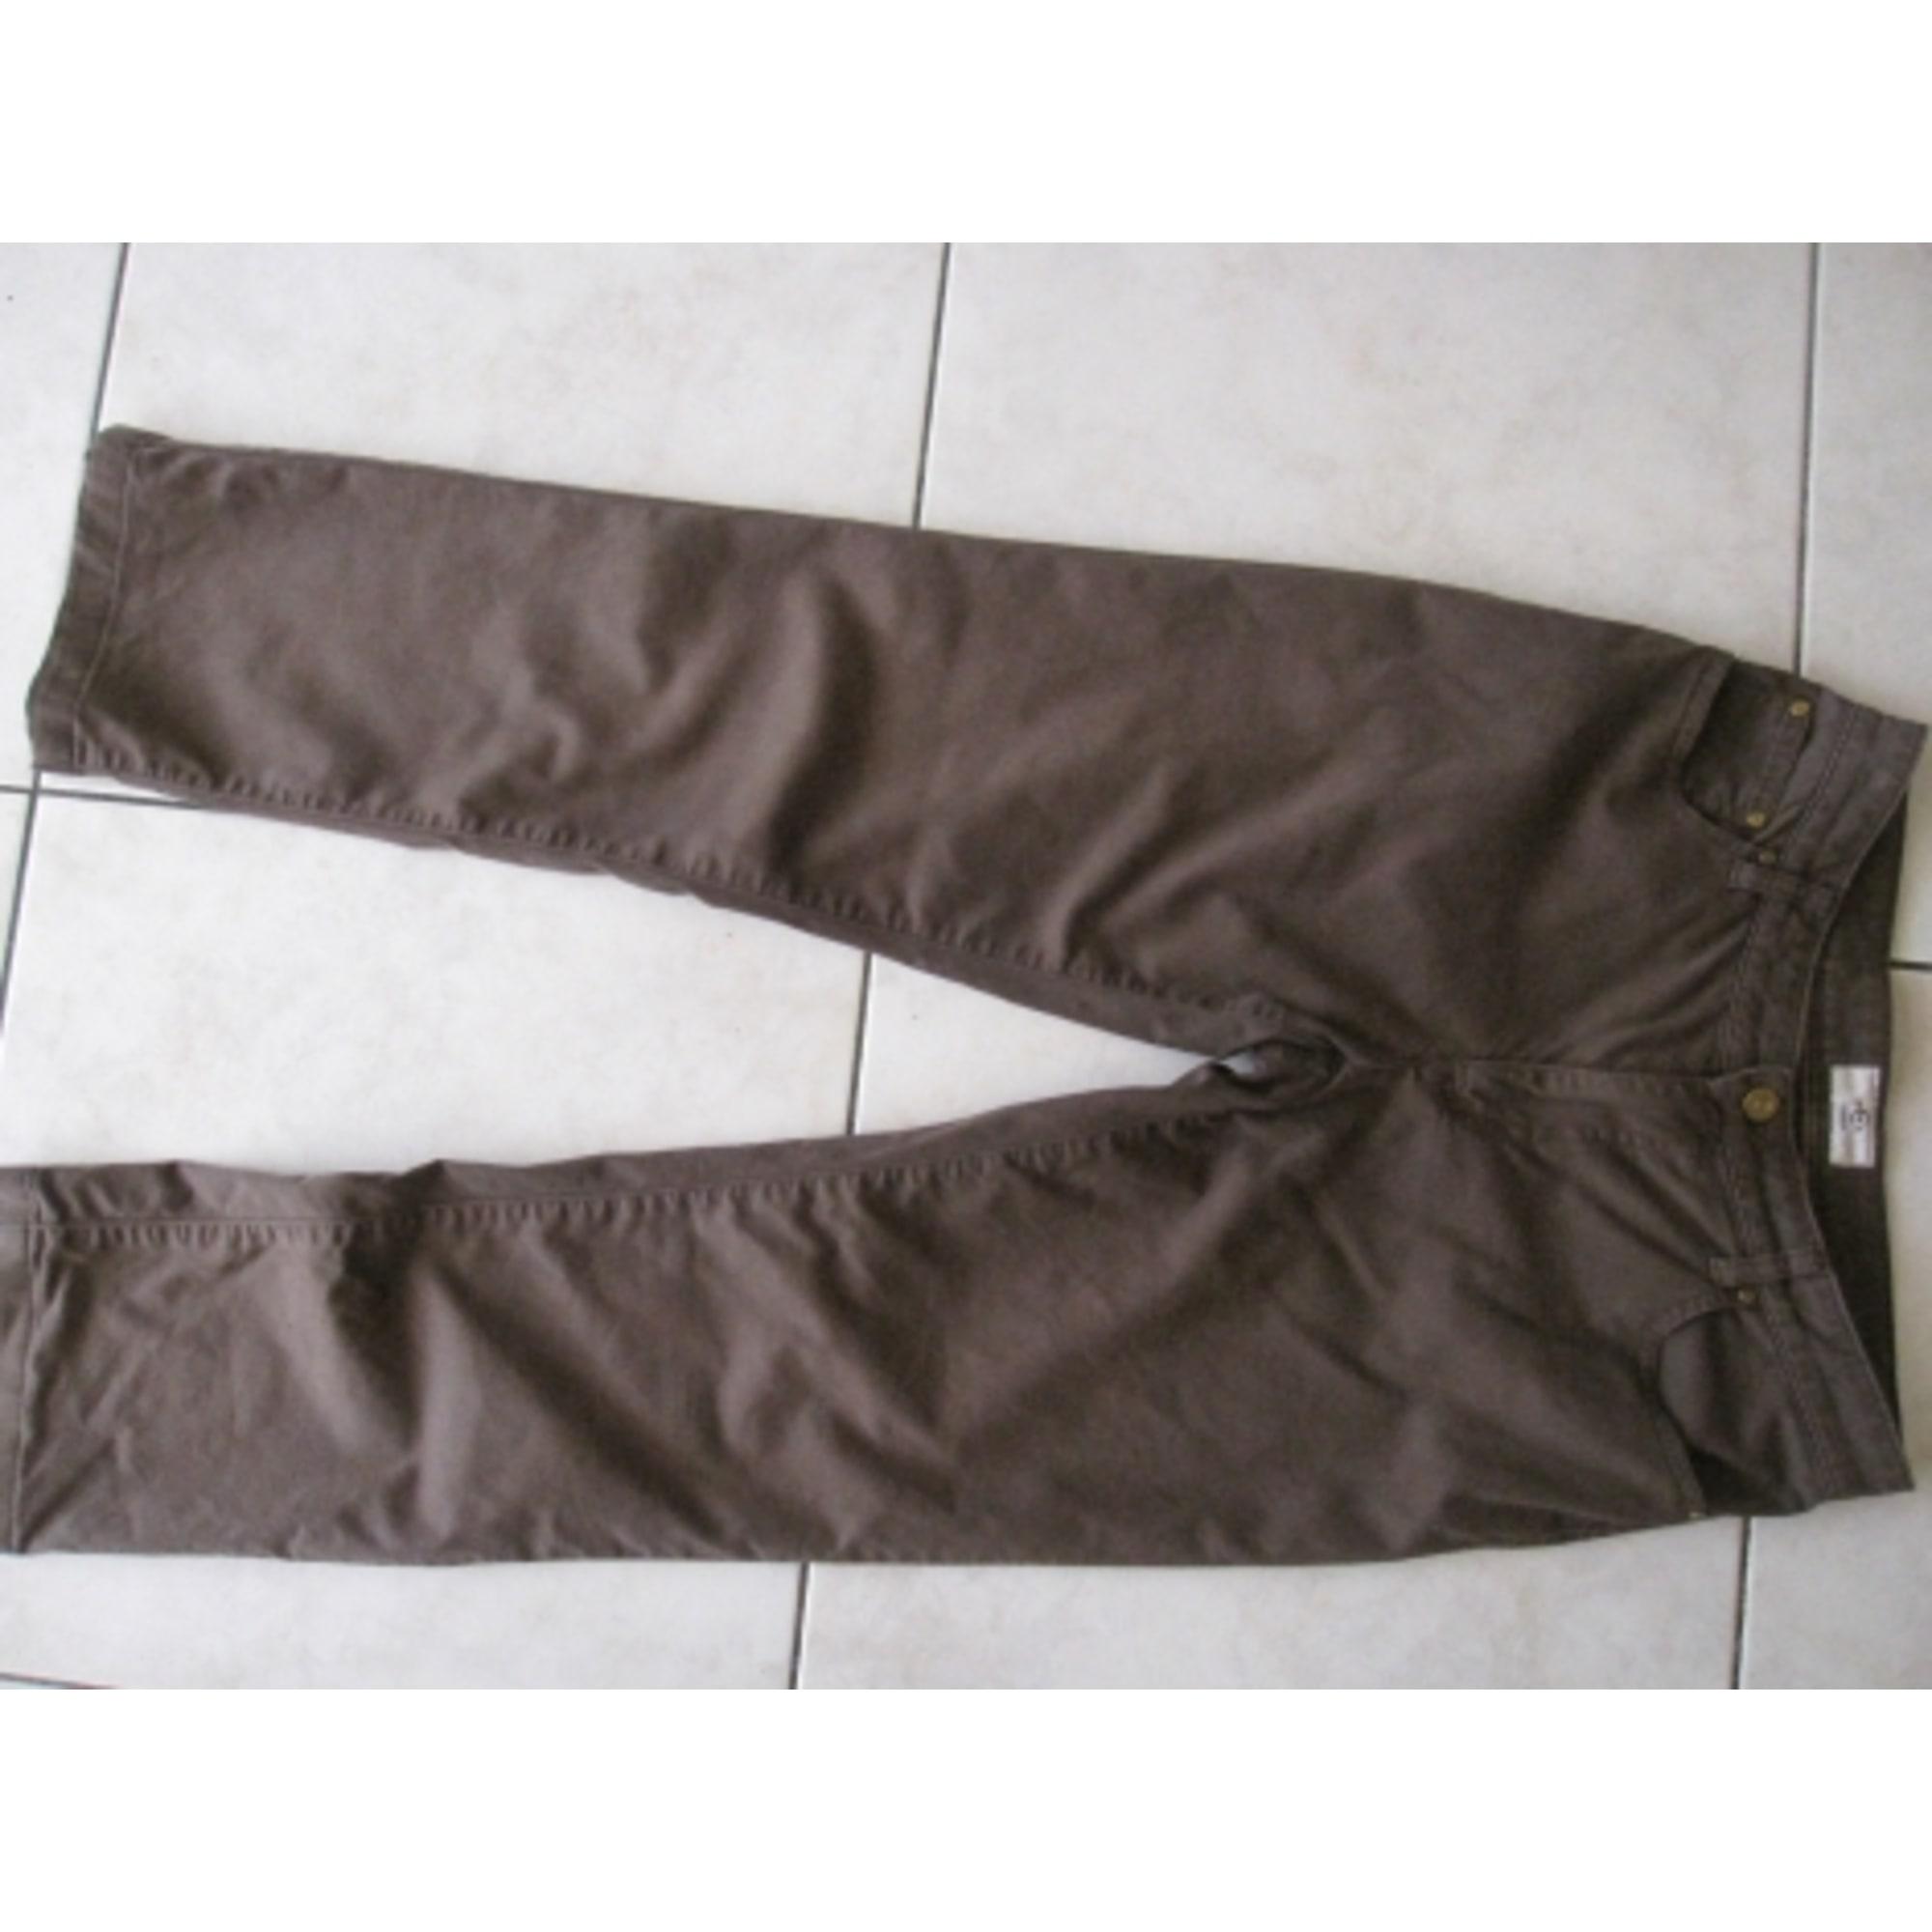 Pantalon droit CERRUTI 1881 Marron